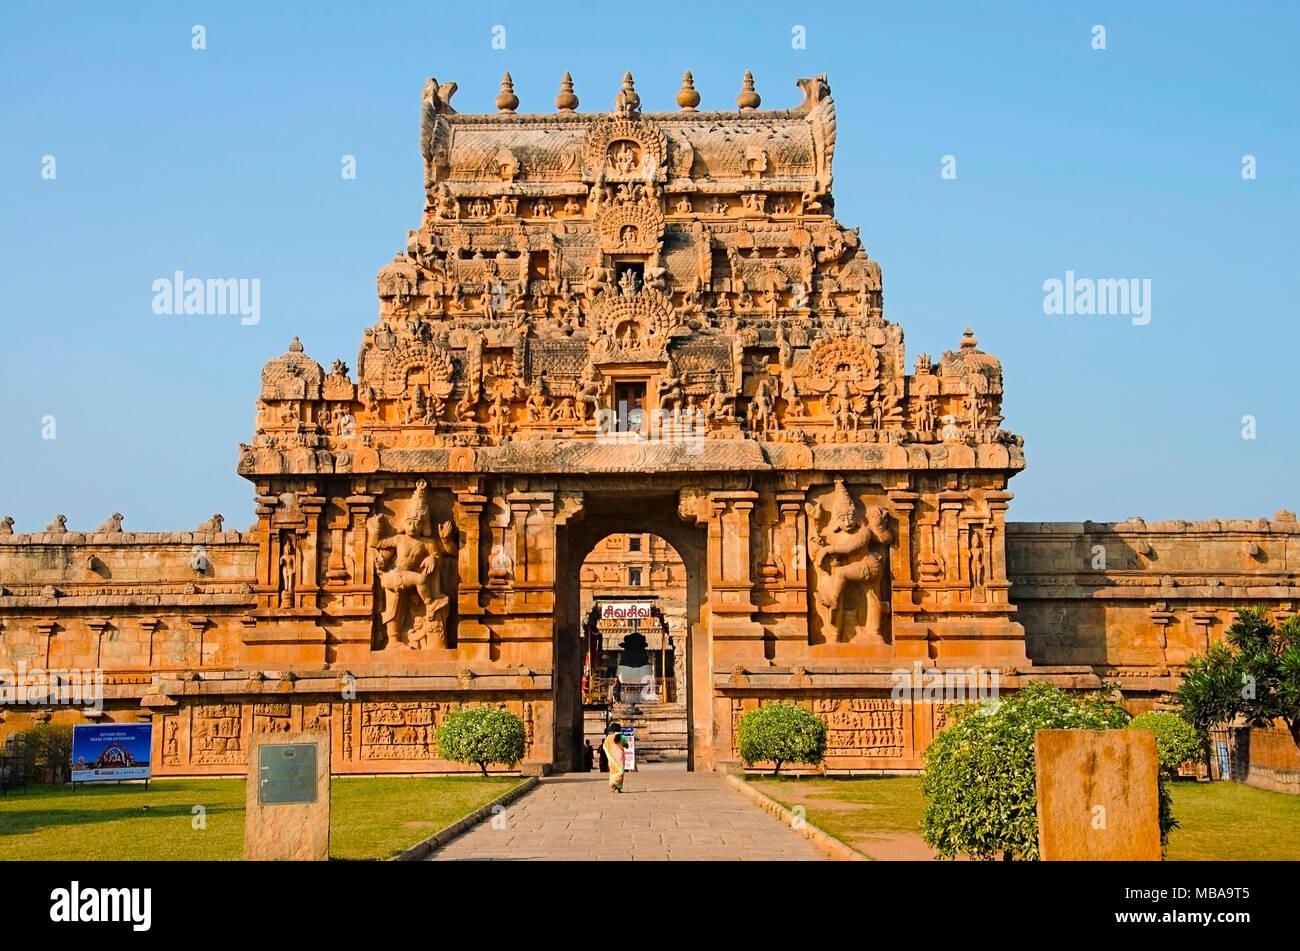 Pierres De Gopuram Et Porte Dentrée Du Temple De Brihadisvara